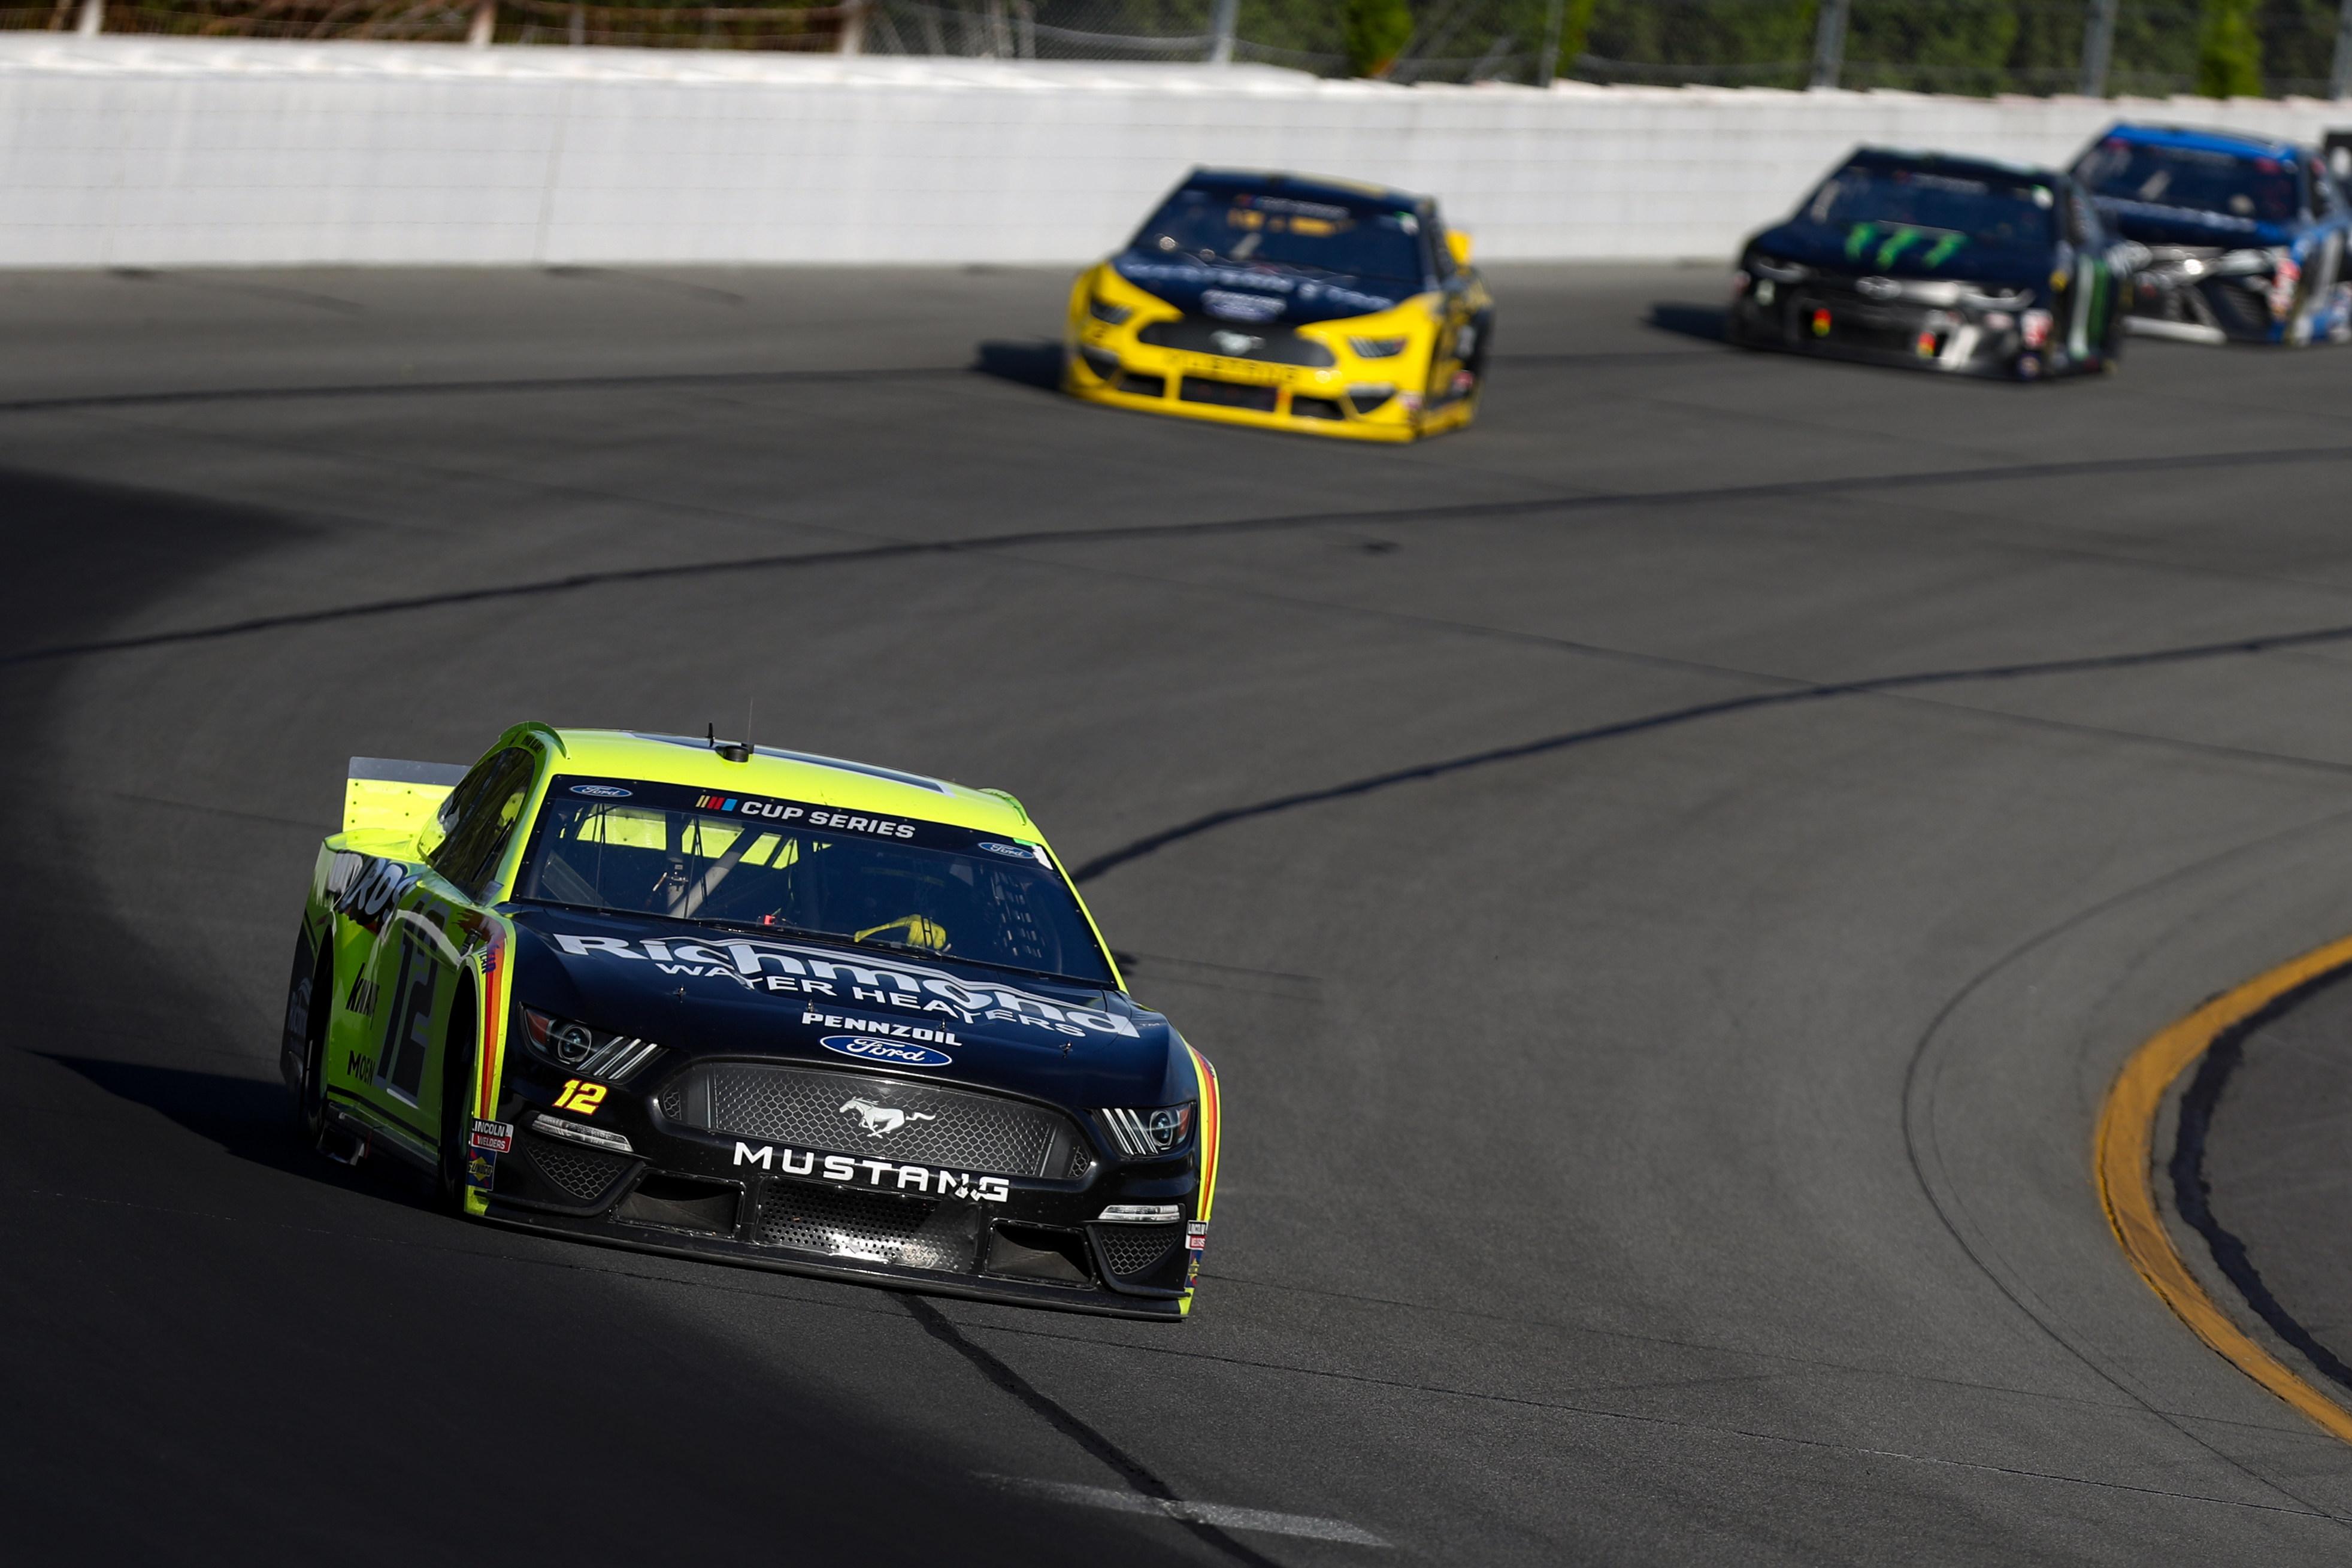 NASCAR Cup Series driver Ryan Blaney leads driver Brad Keselowski during the Pocono 350 at Pocono Raceway.